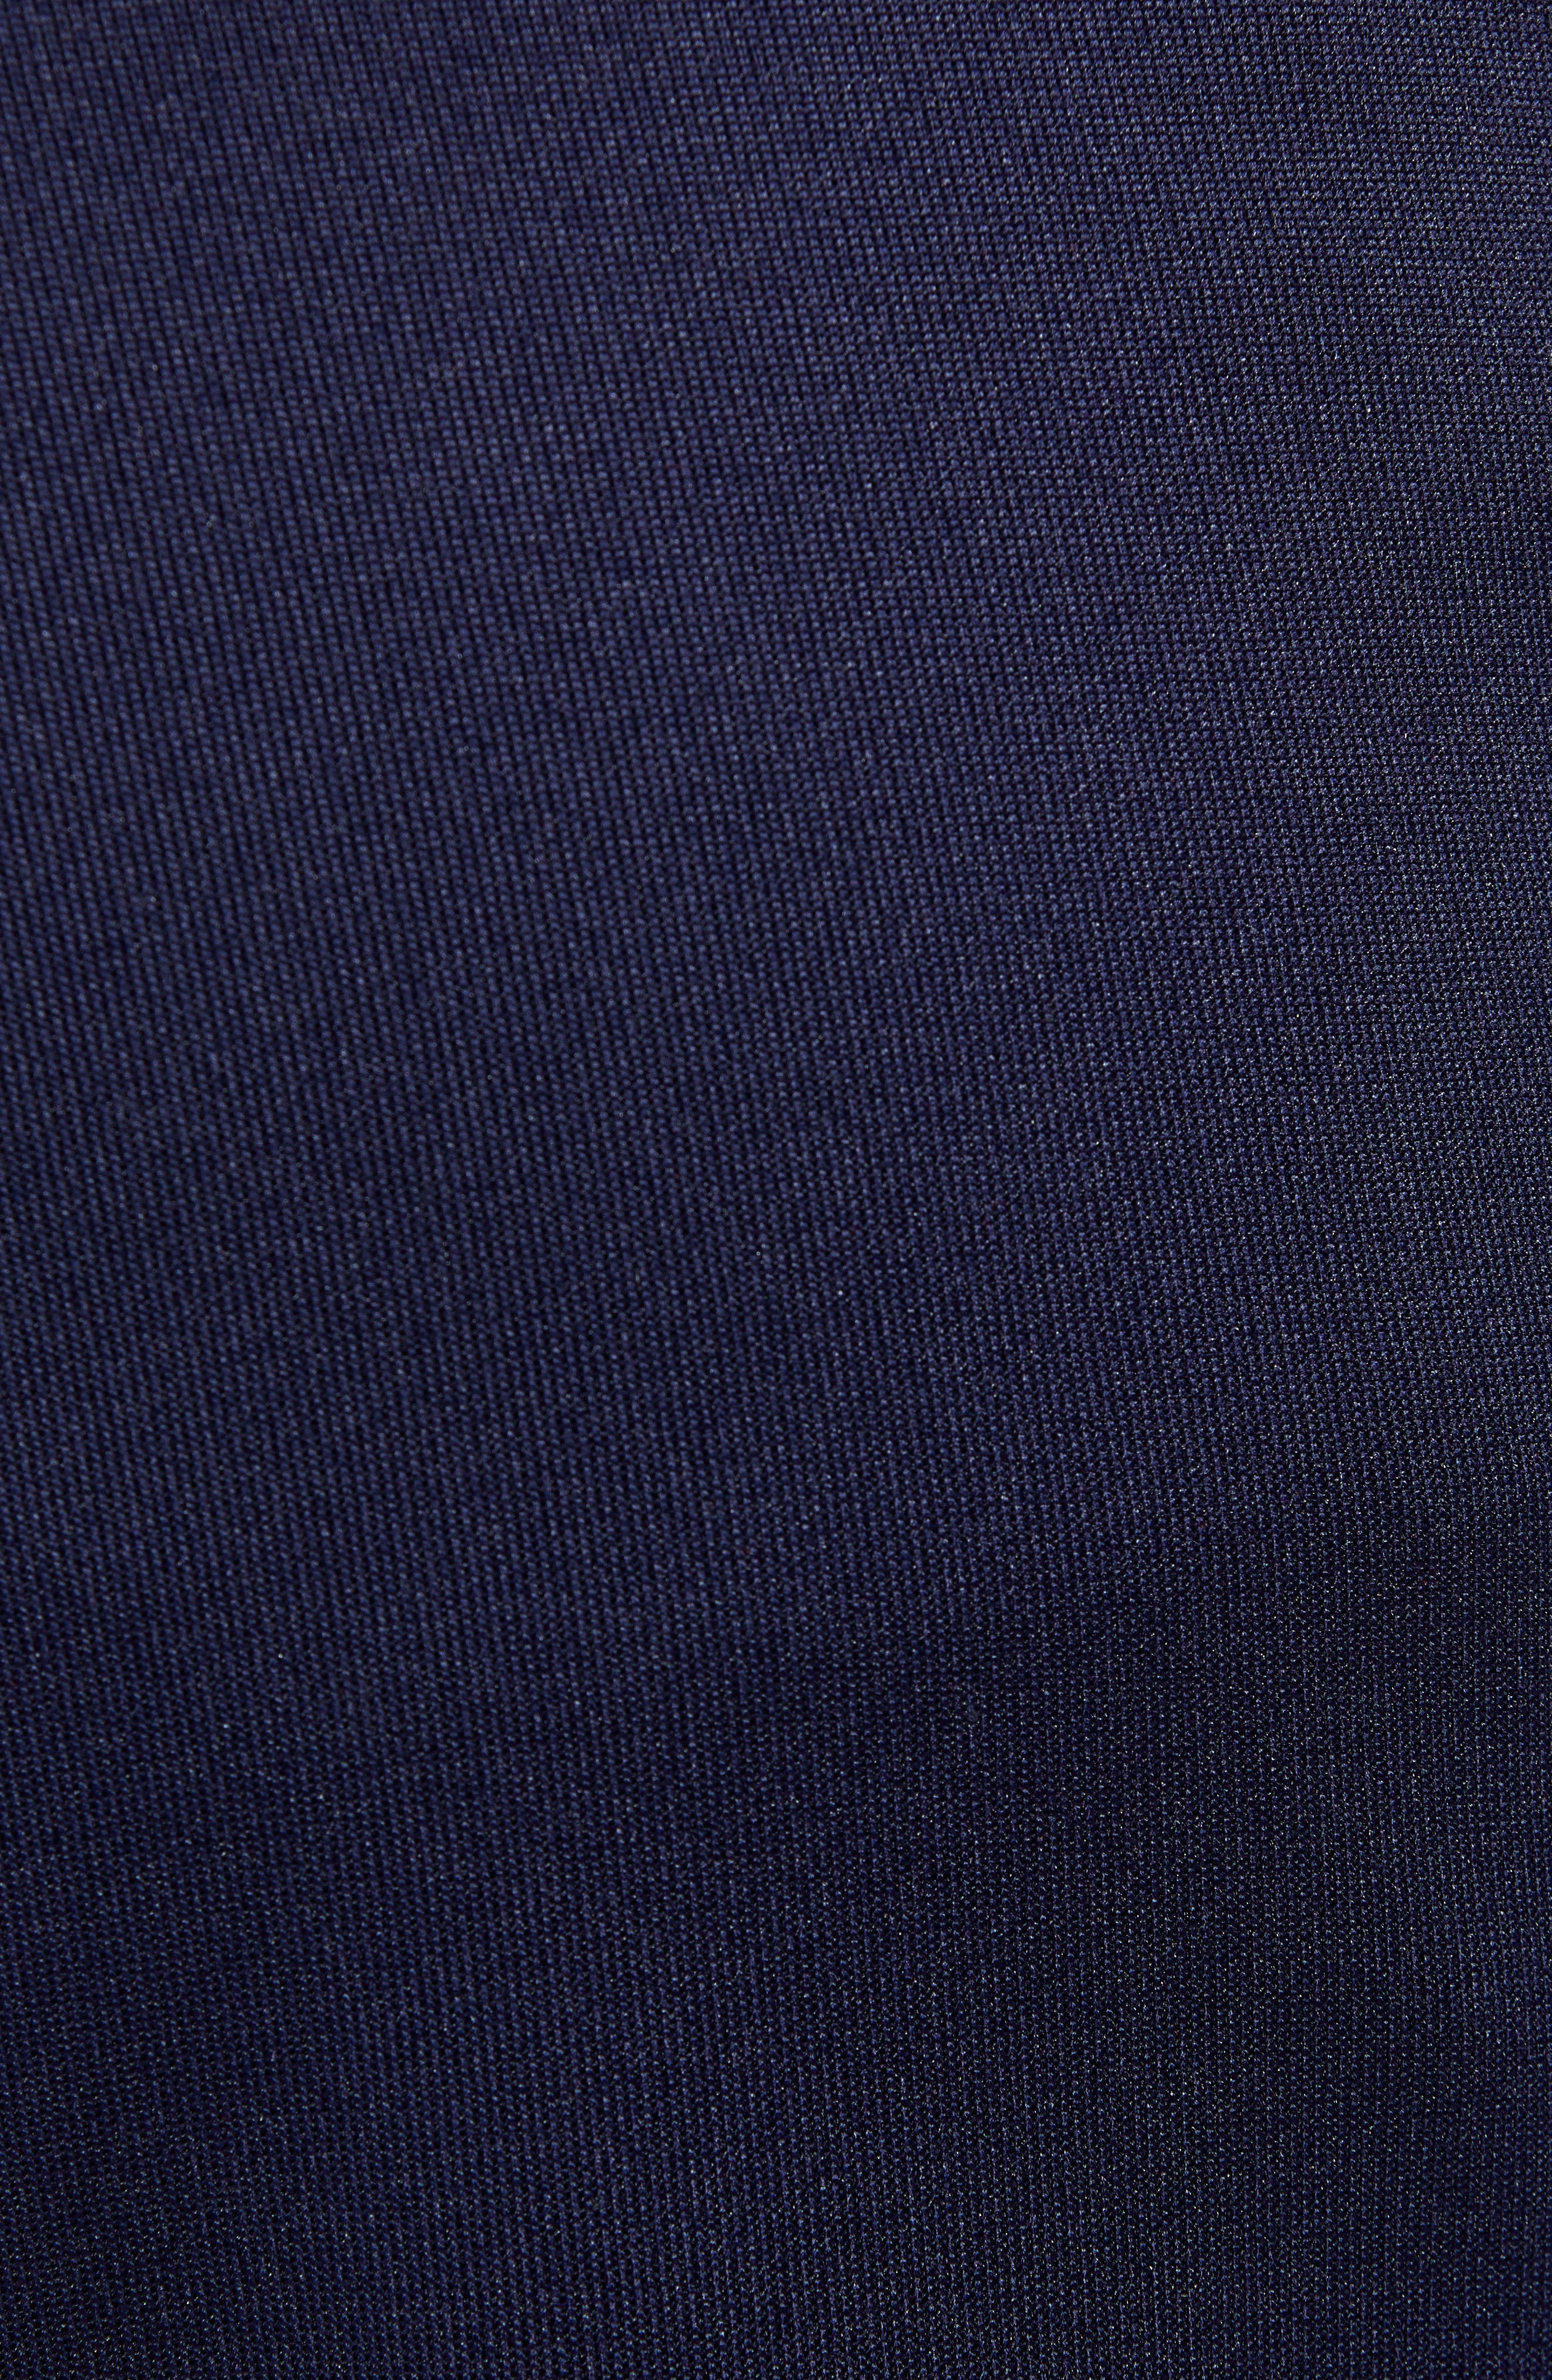 NIKE,                             x Martine Rose Men's Track Pants,                             Alternate thumbnail 5, color,                             BLACKENED BLUE/ FIR